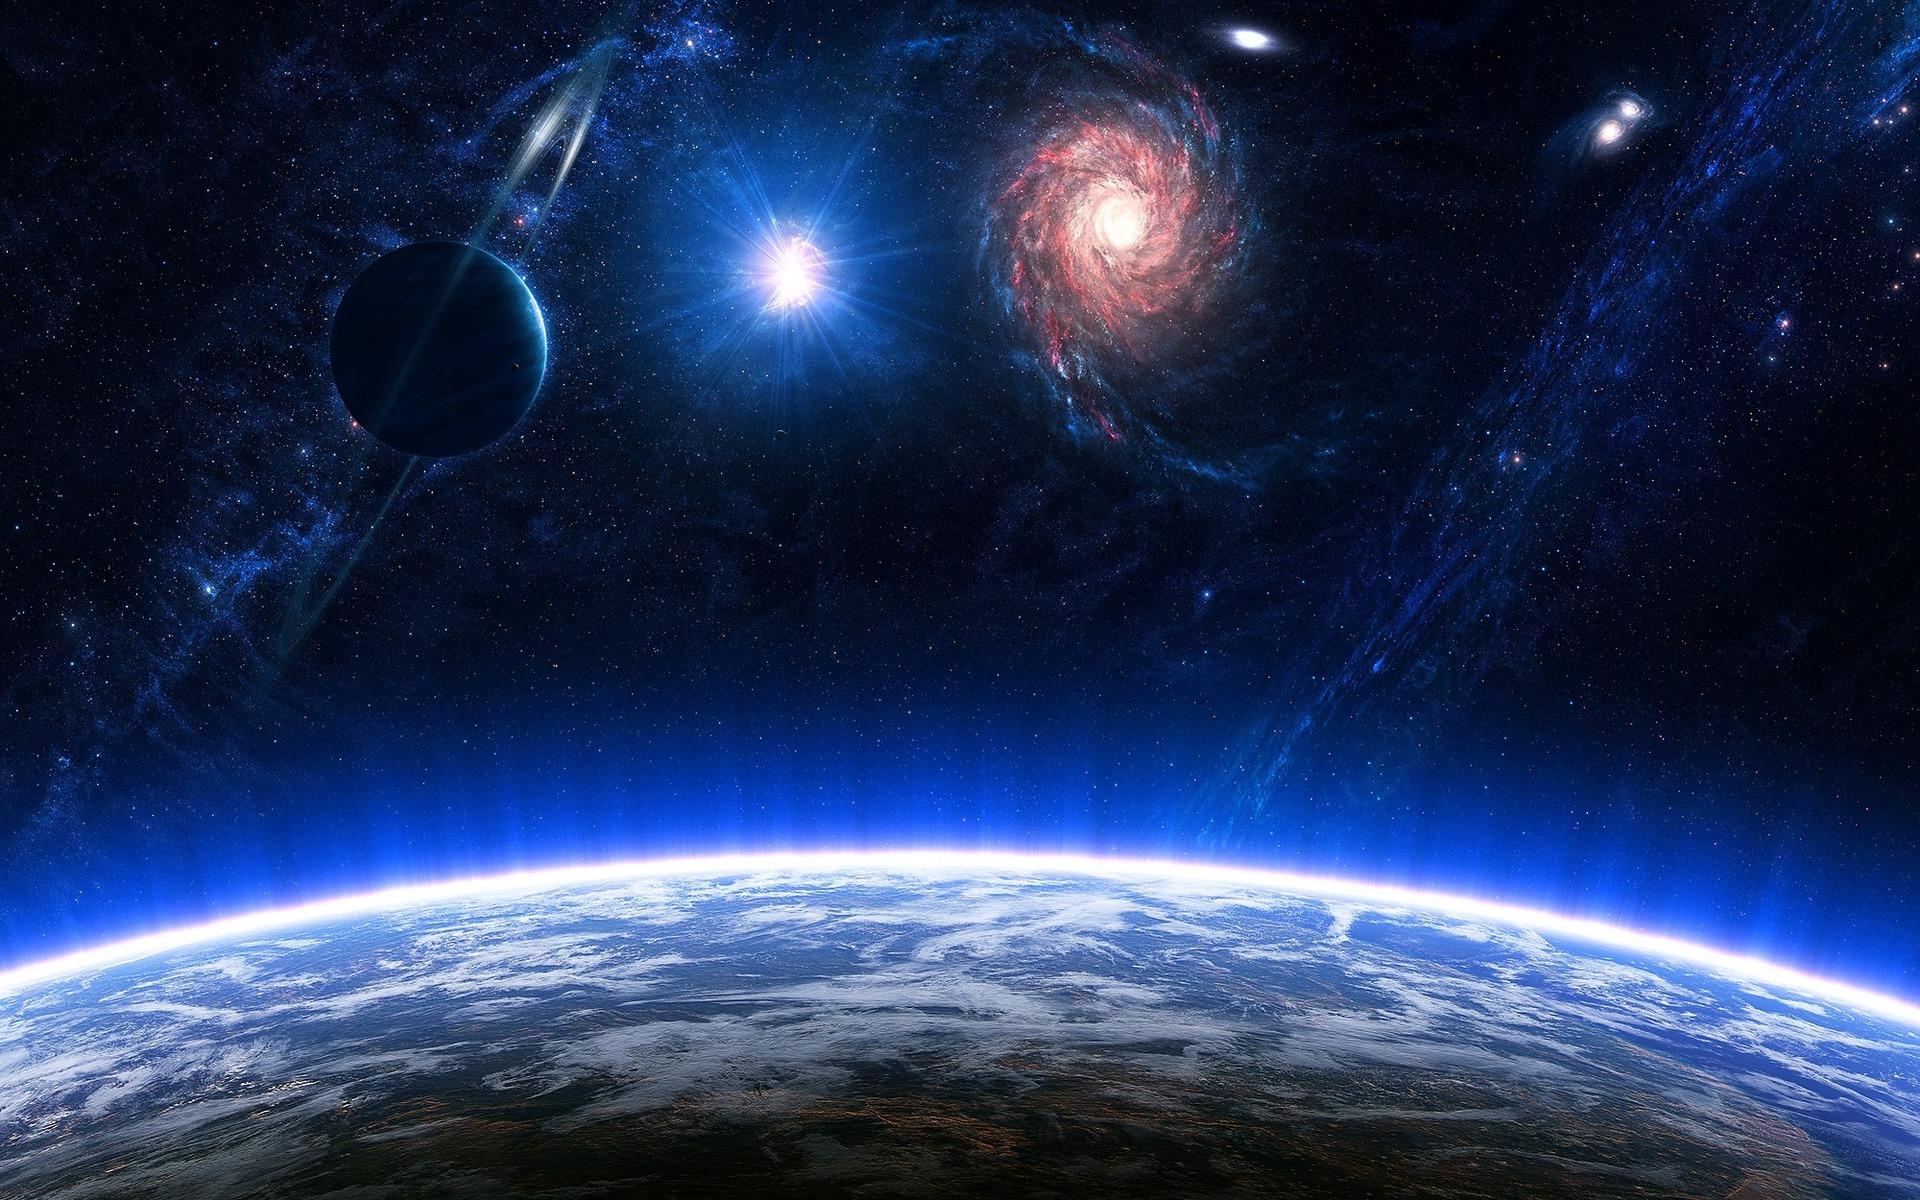 Обои космос планетыпр картинки на рабочий стол на тему Космос - скачать скачать